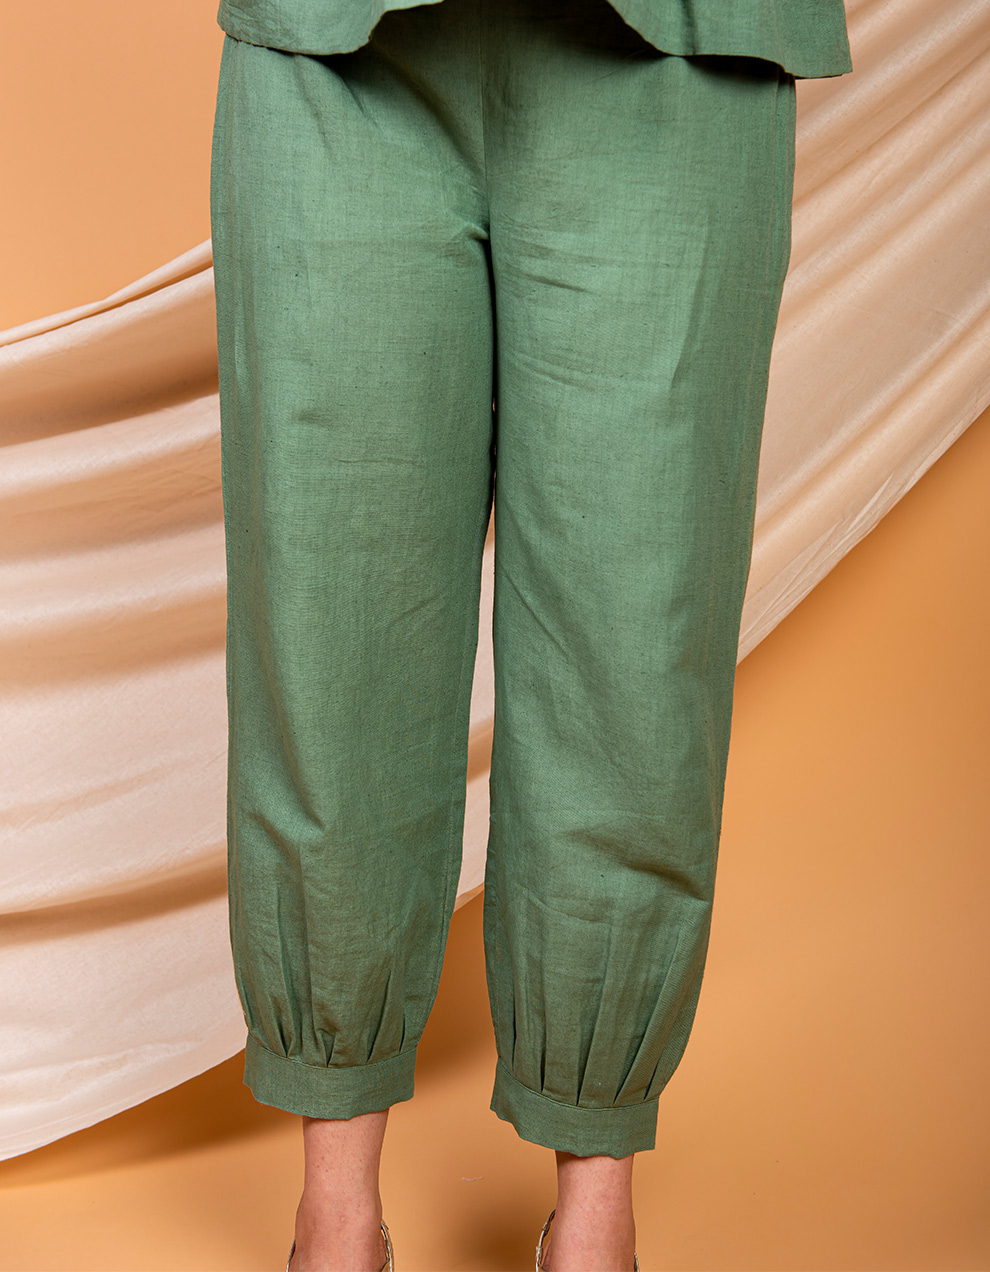 Green cotton linen Pants